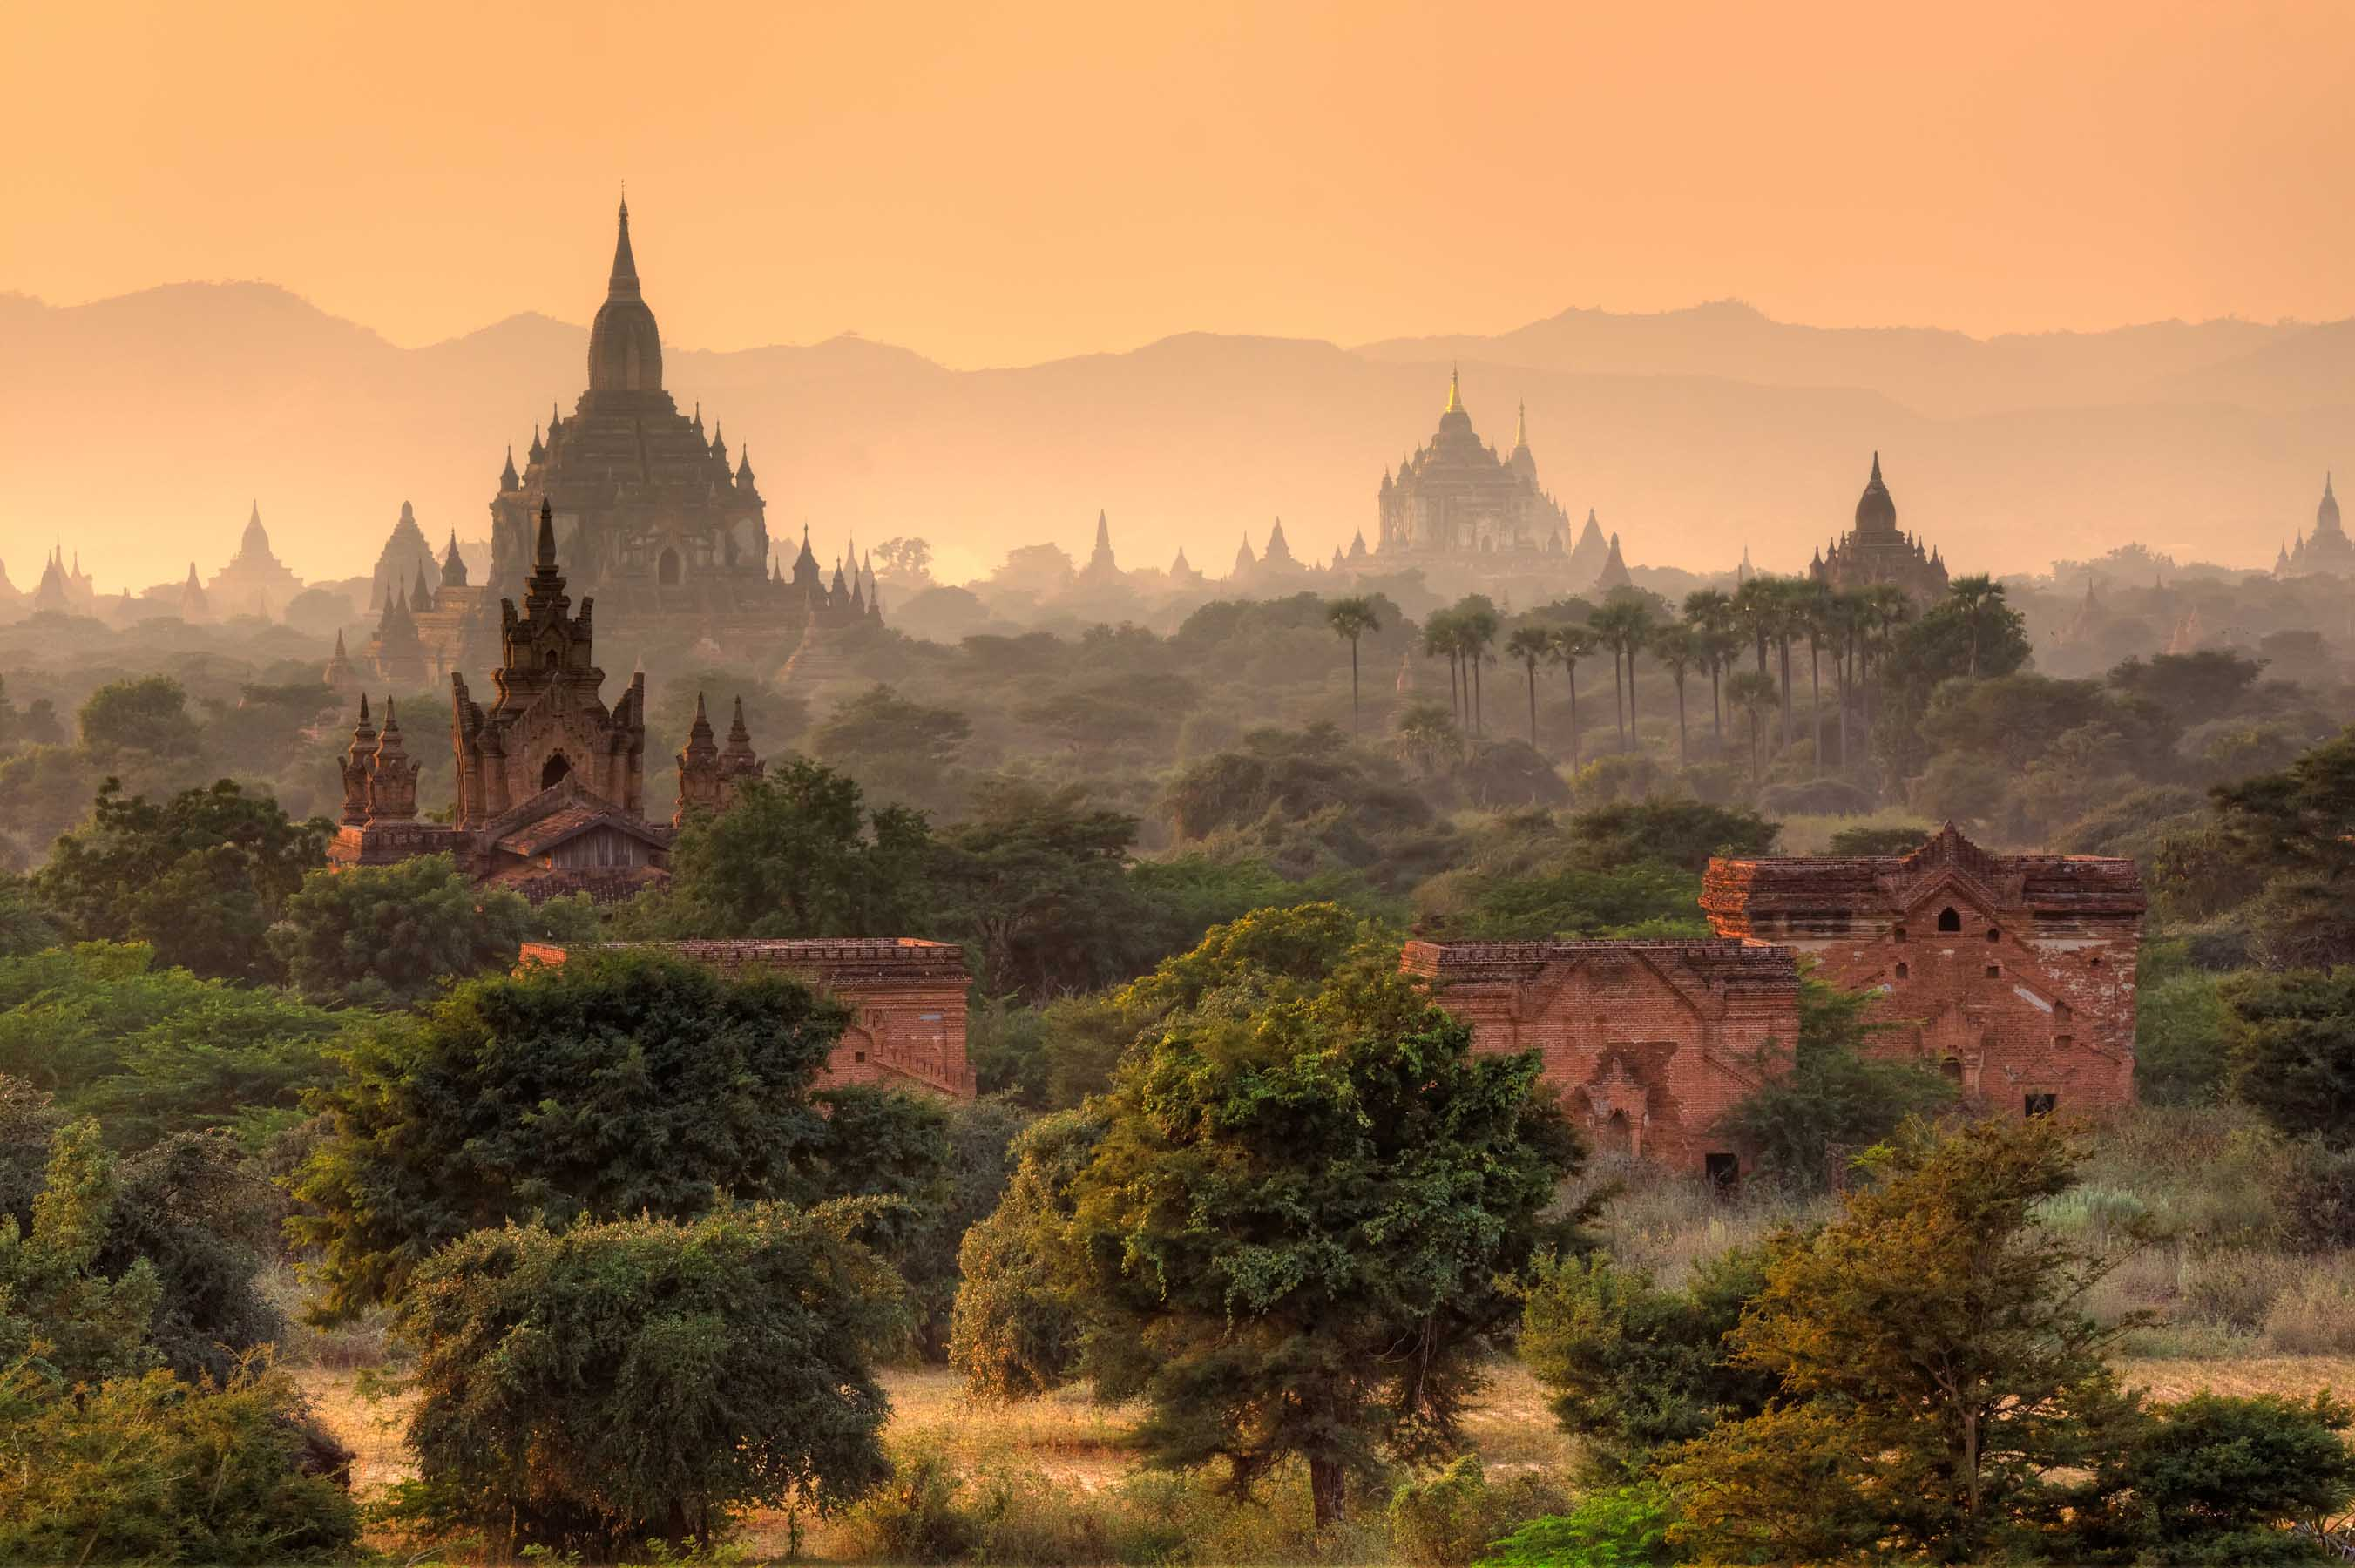 Burmese Wallpapers - Top Free Burmese